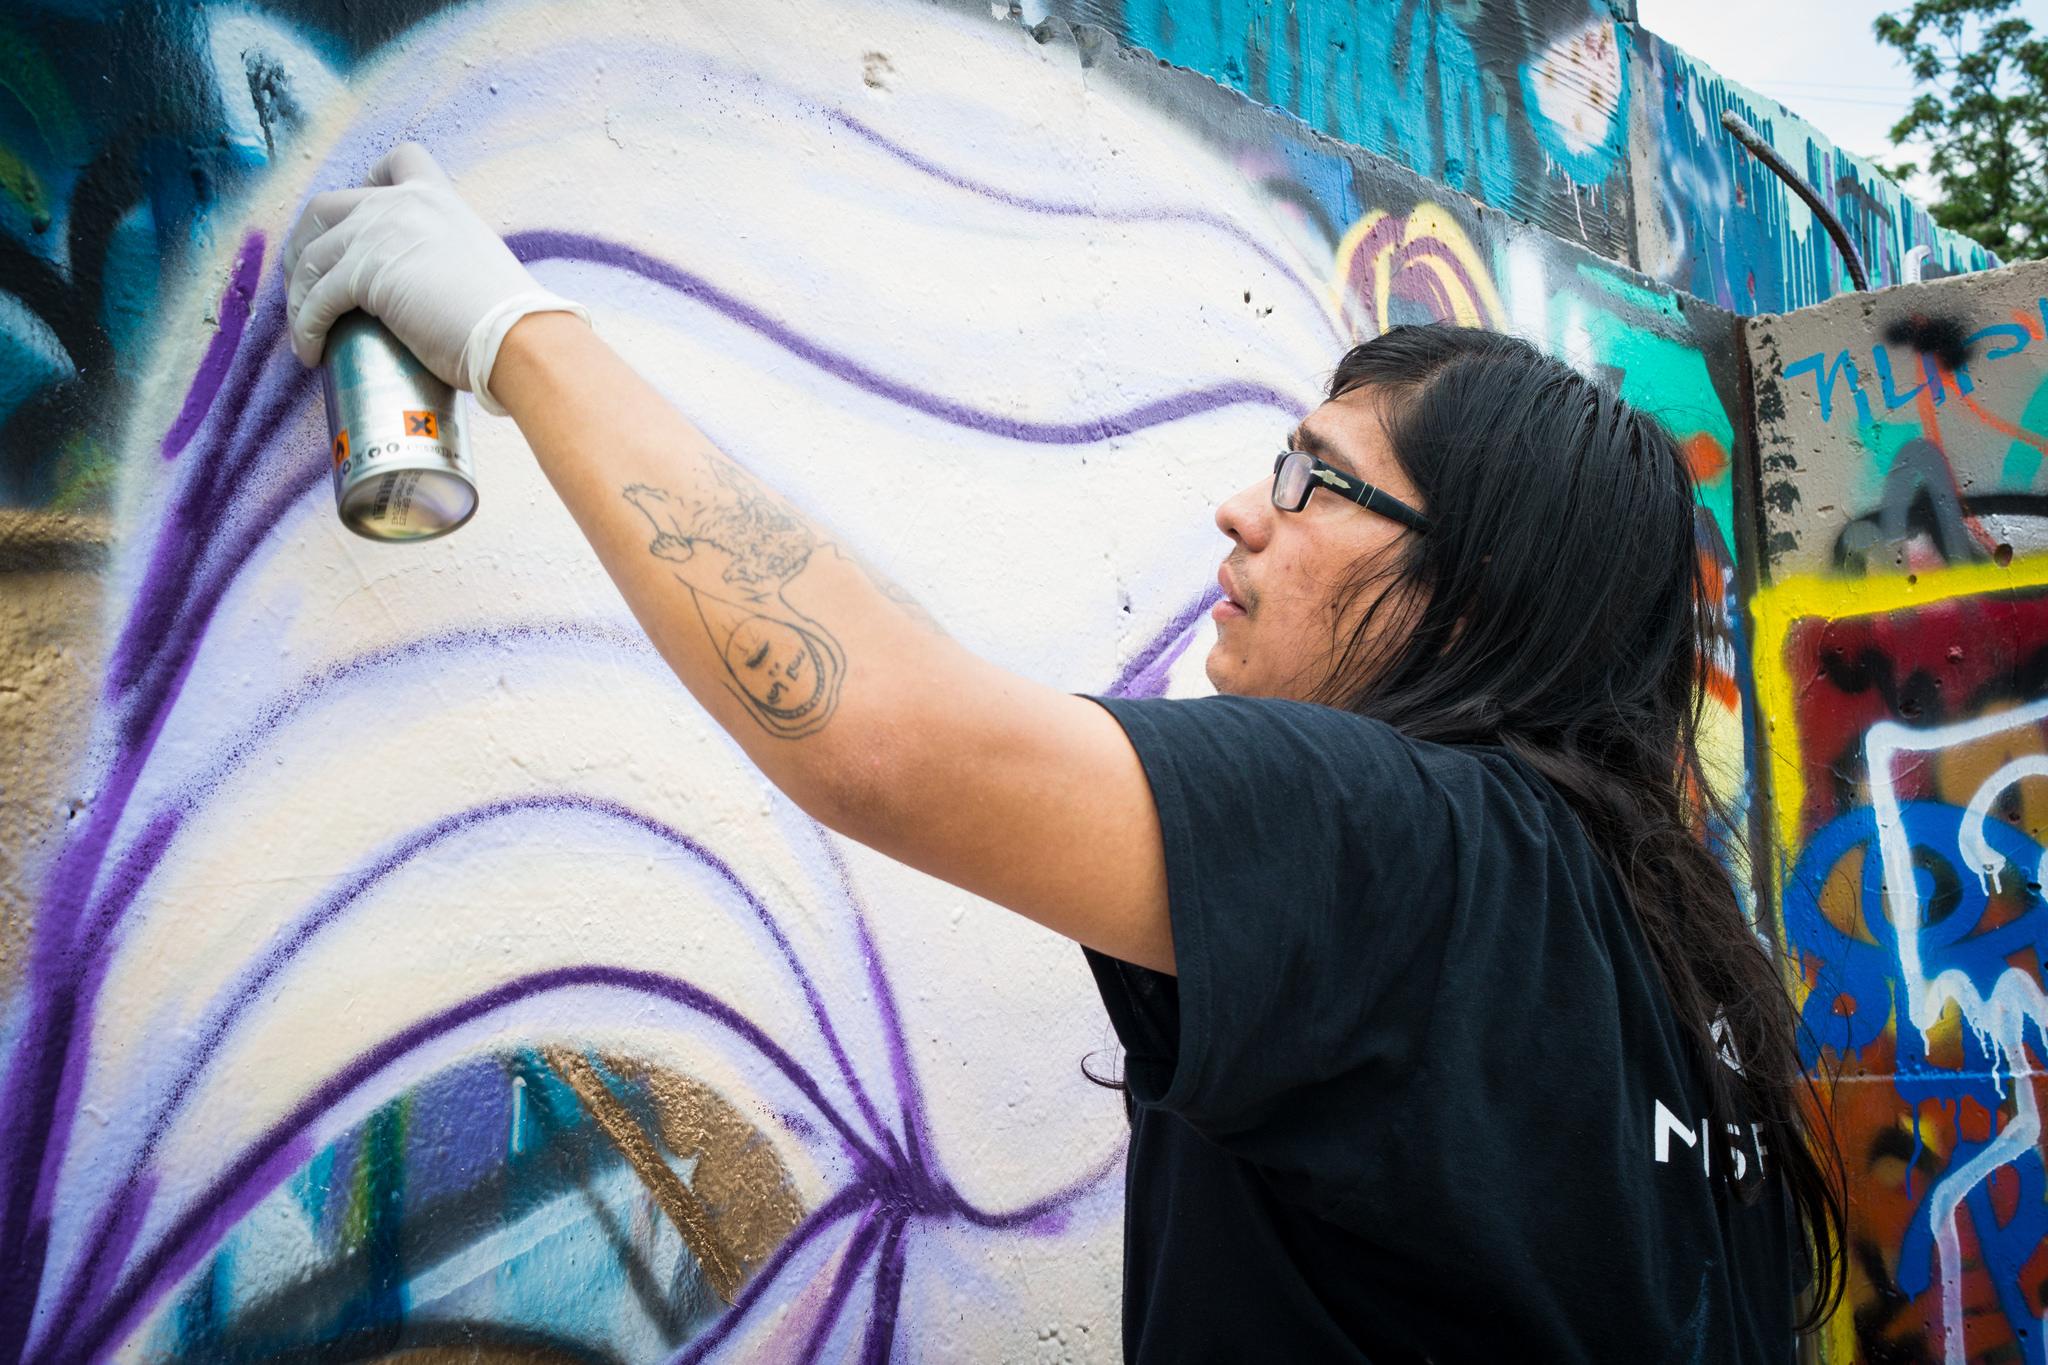 street art artist hope outdoor gallery graffiti spray paint mural wall painting